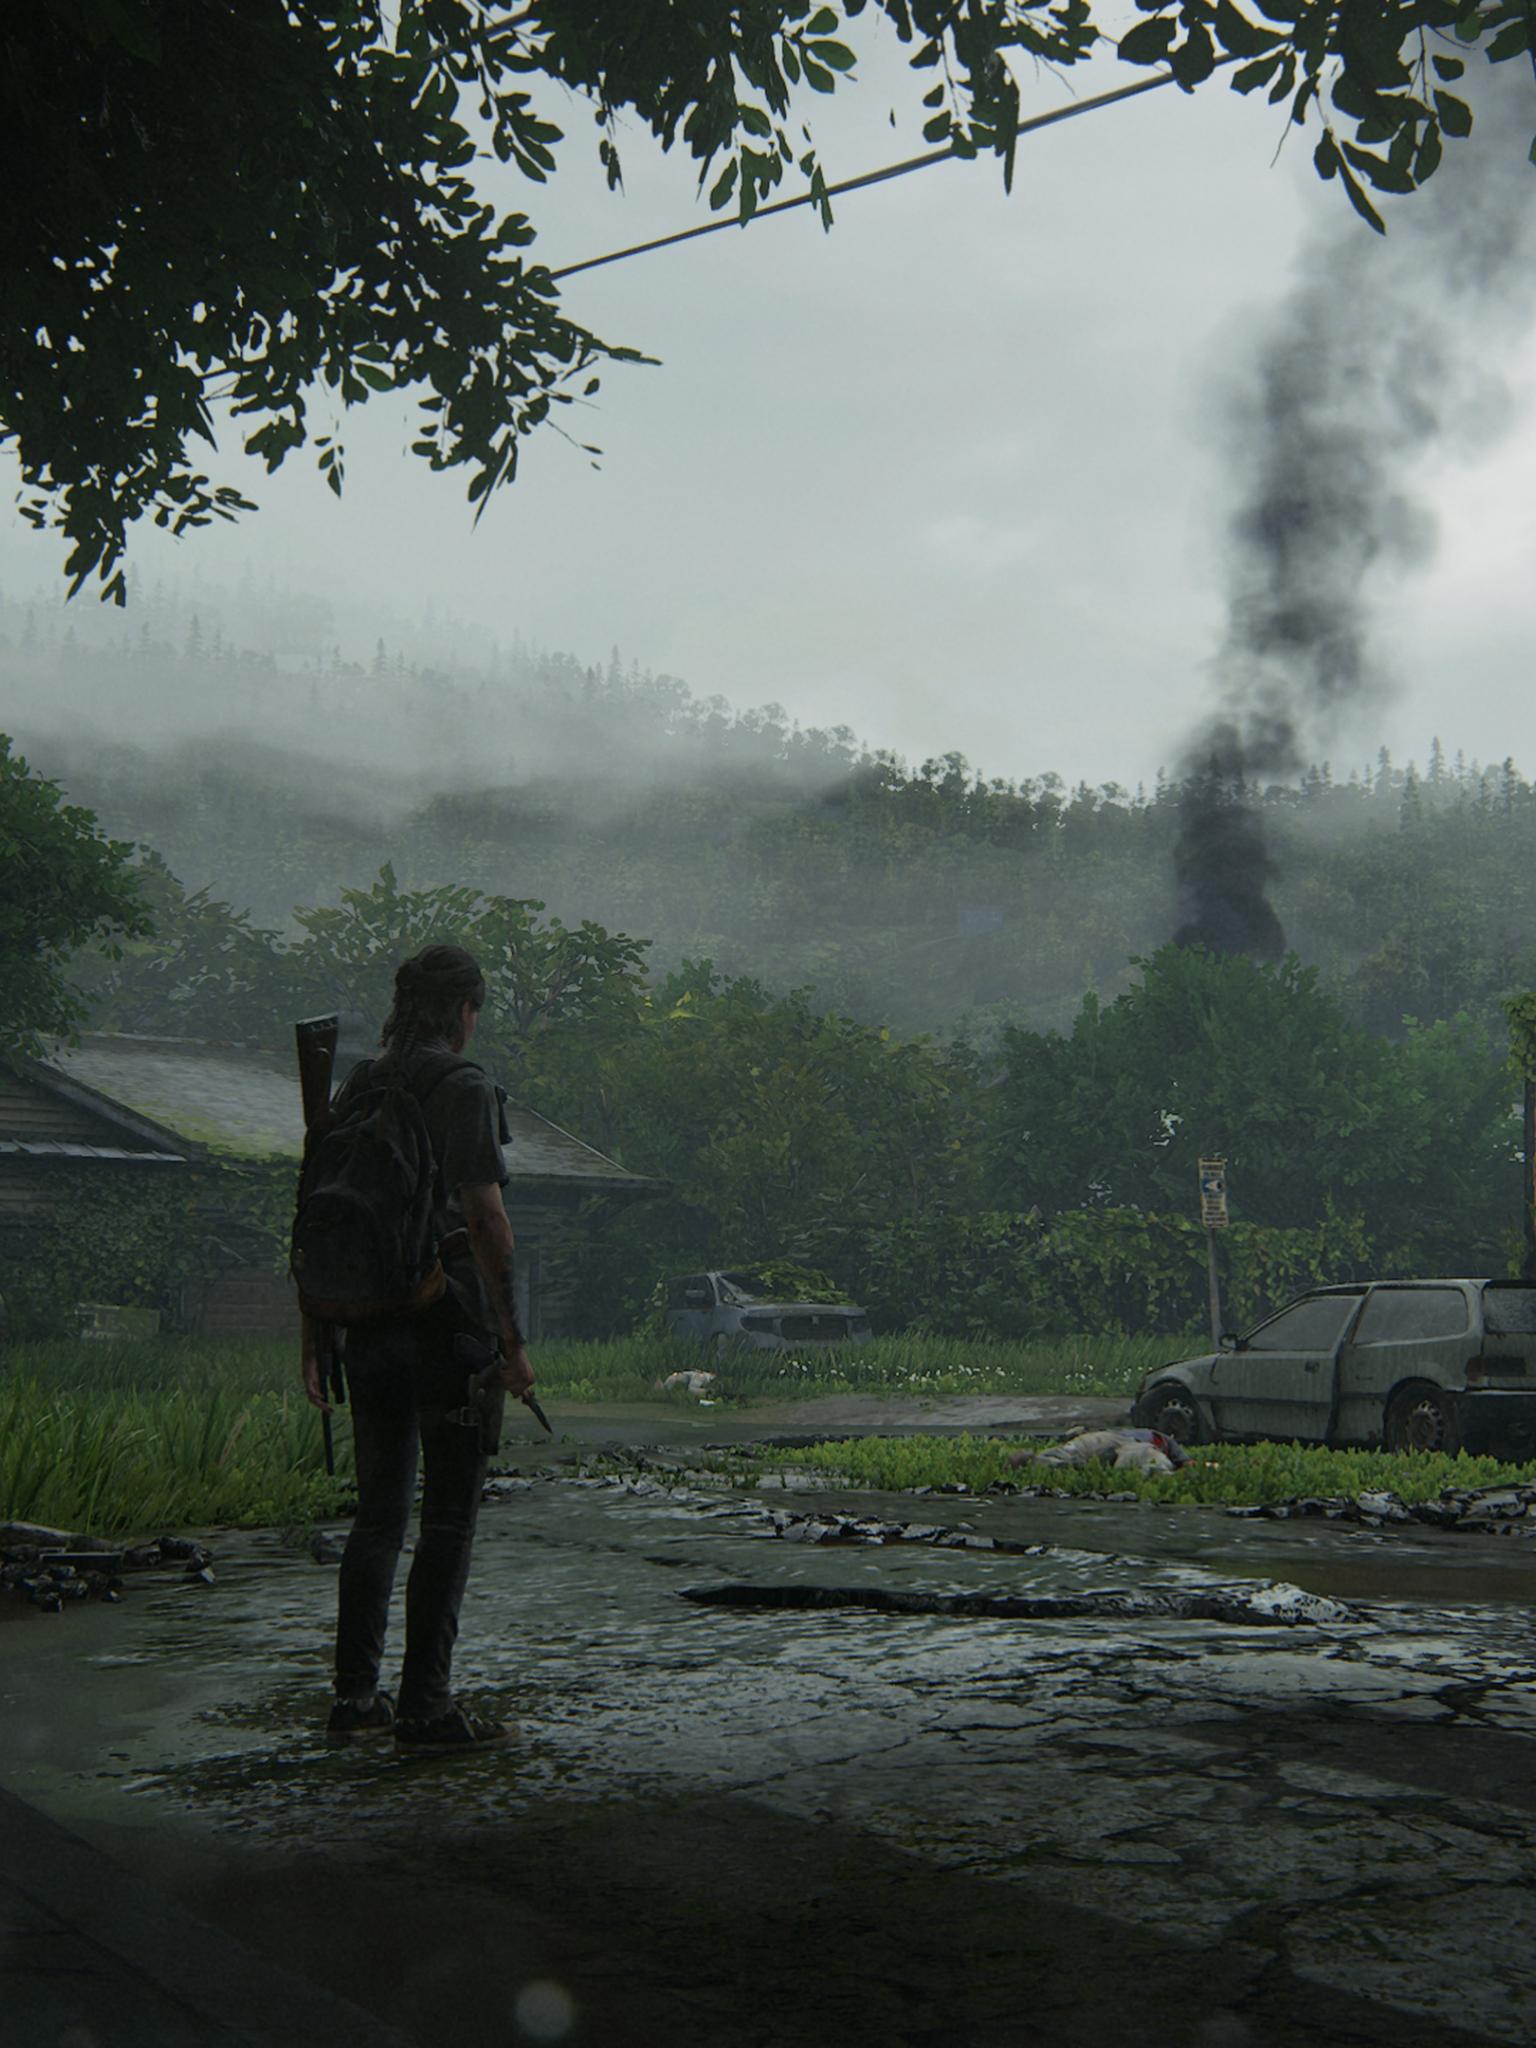 download The Last of Us Part II Wallpaper HD Games 4K 1536x2048